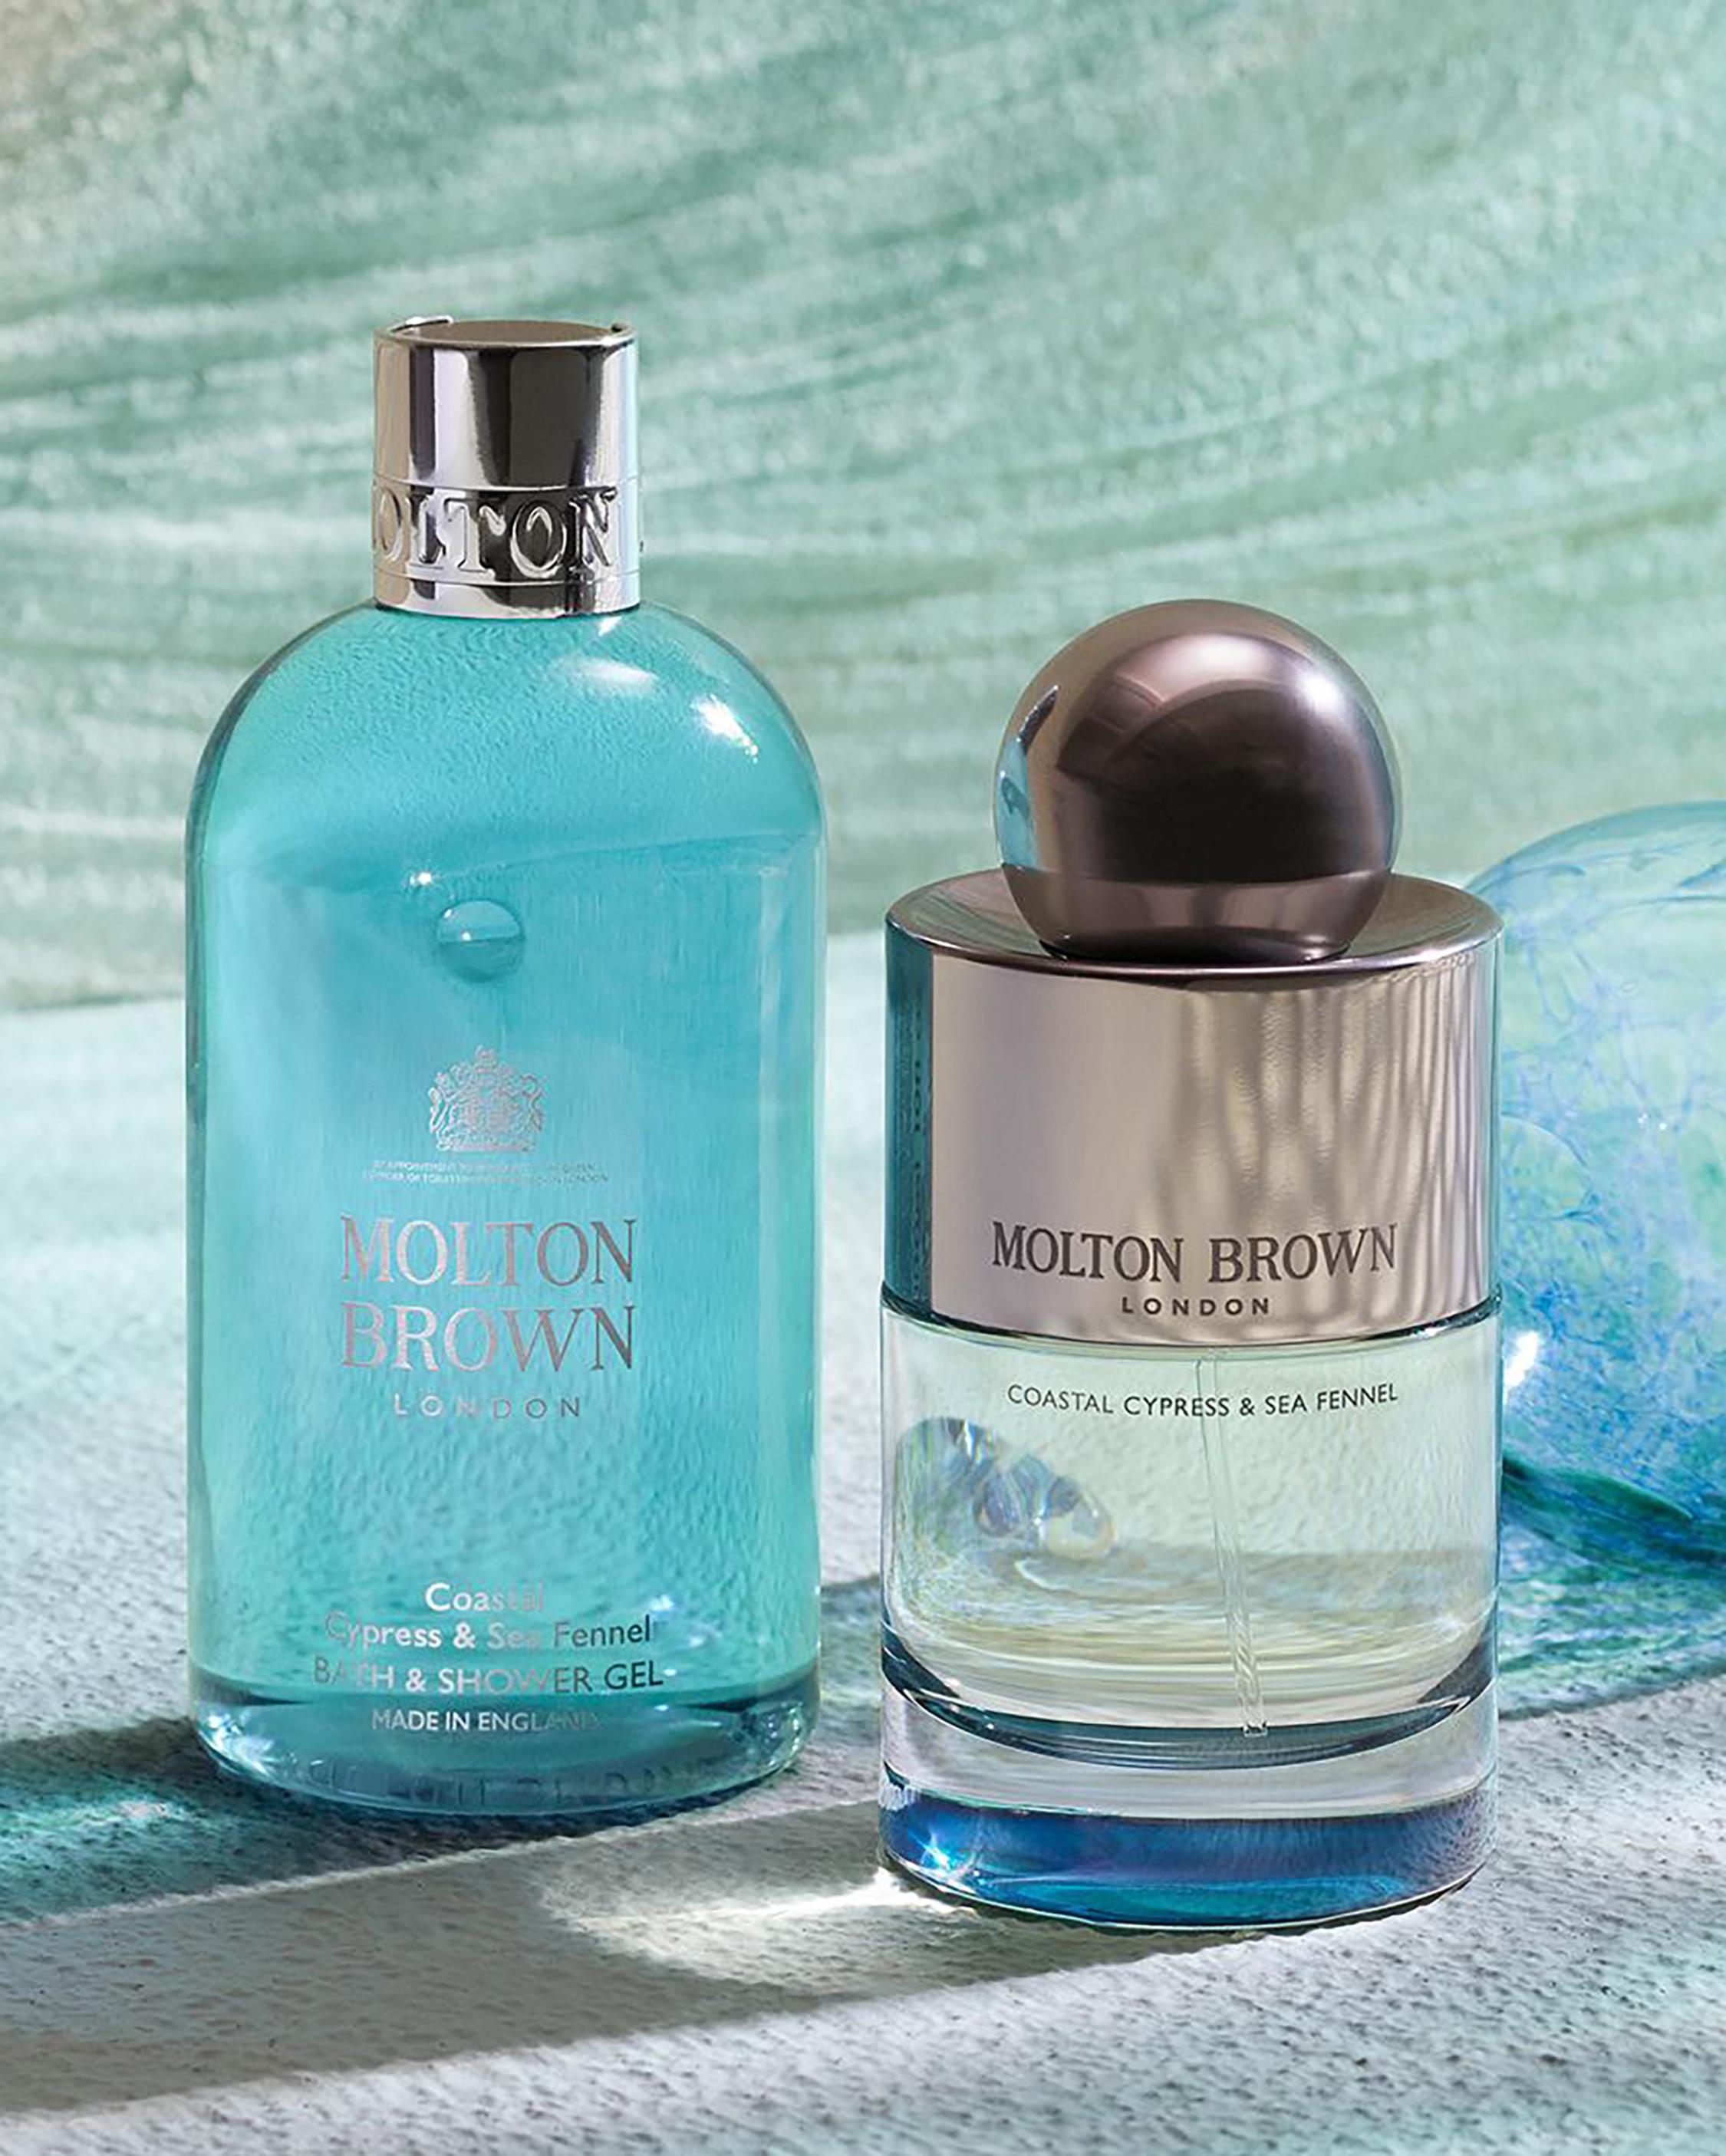 Molton Brown Coastal Cypress & Sea Fennel Fragrance Collection 1